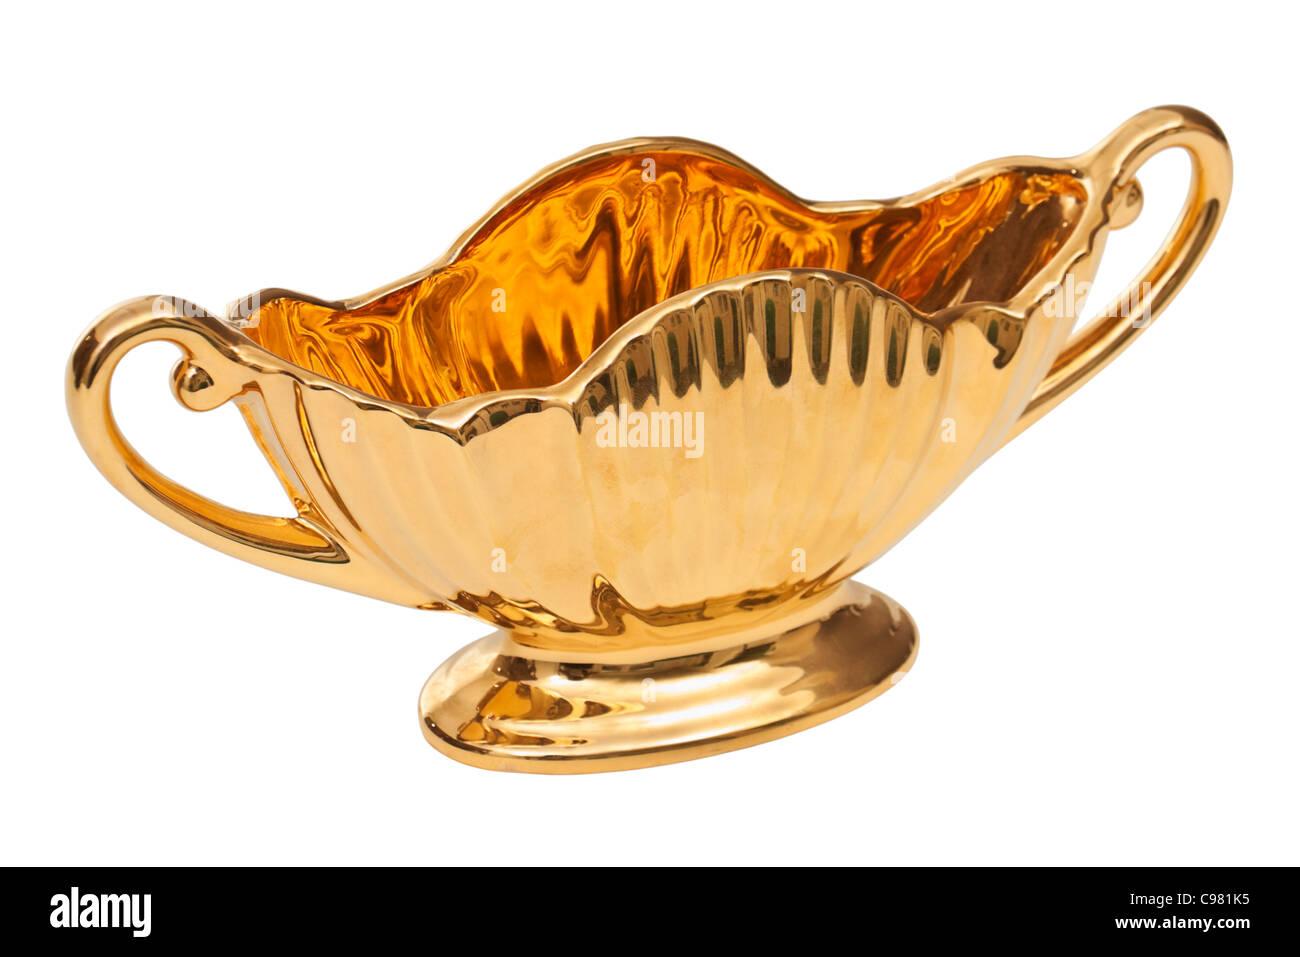 Royal Winton (Grimwades) gilded ceramic pose bowl - Stock Image